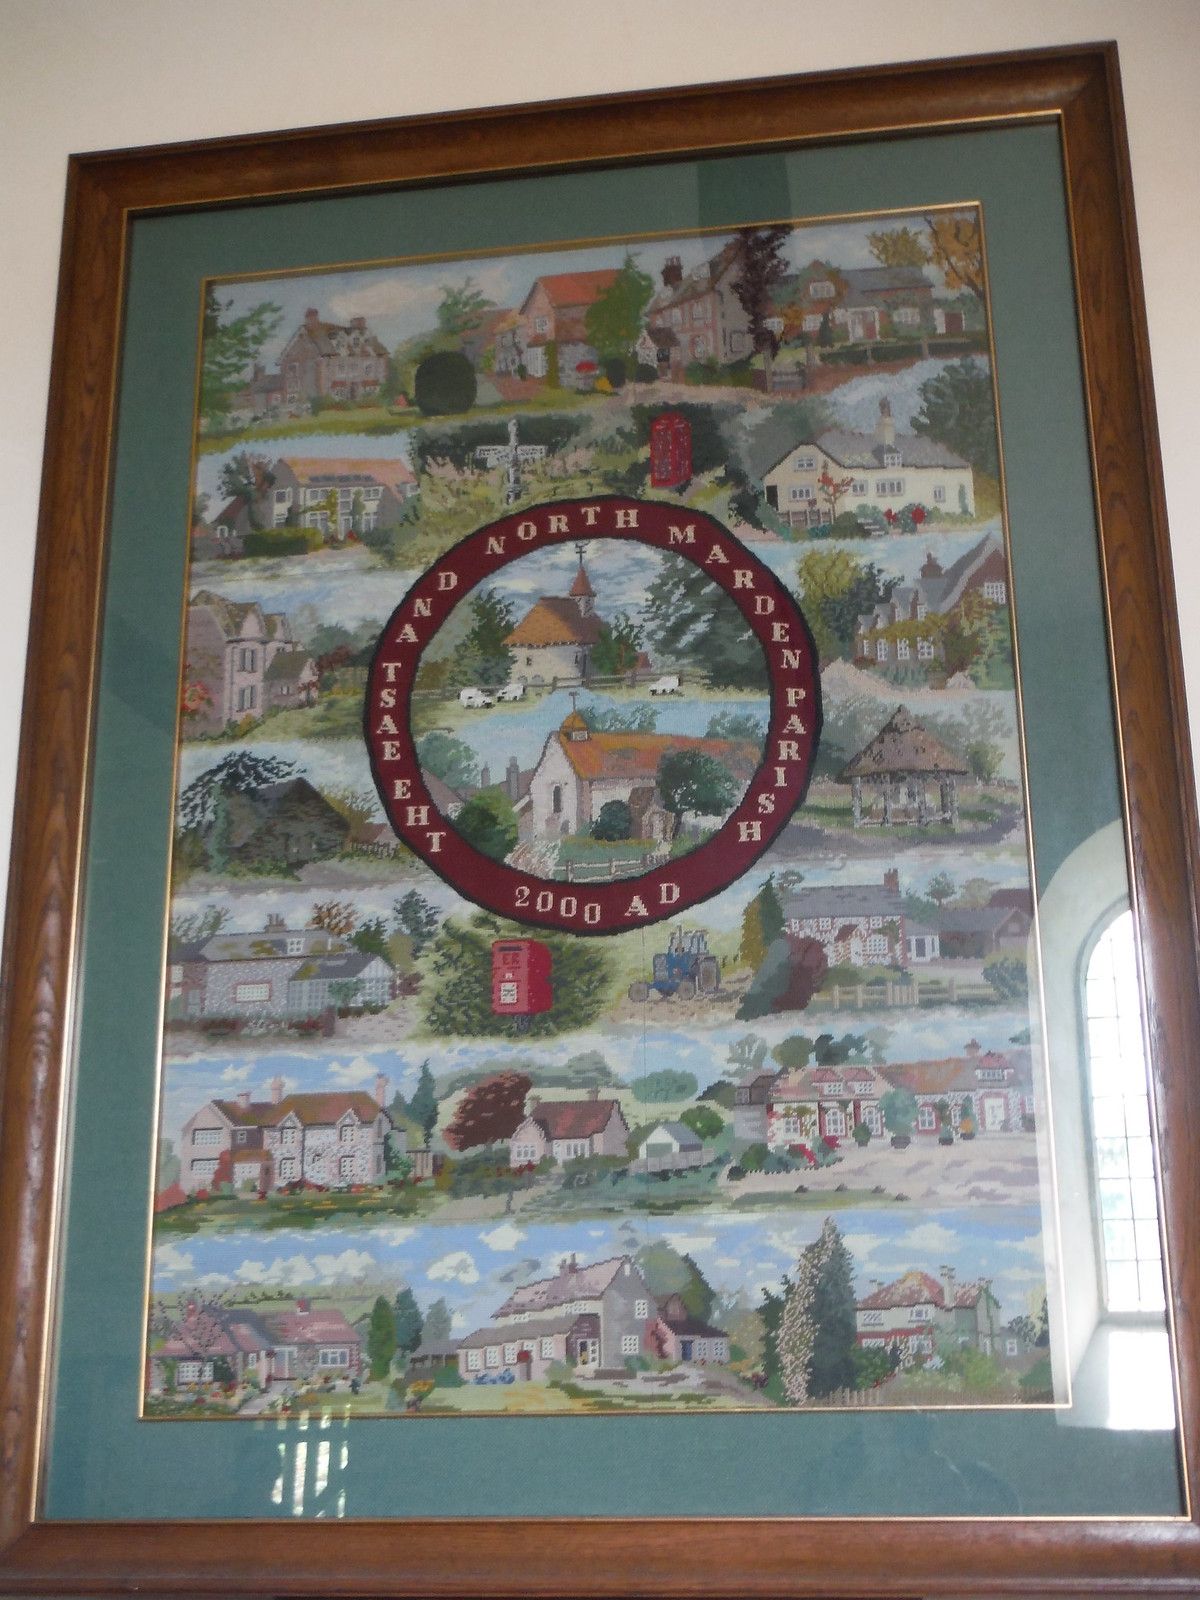 Millenium Tapestry, St. Peter's, East Marden SWC Walk Rowlands Castle Circular